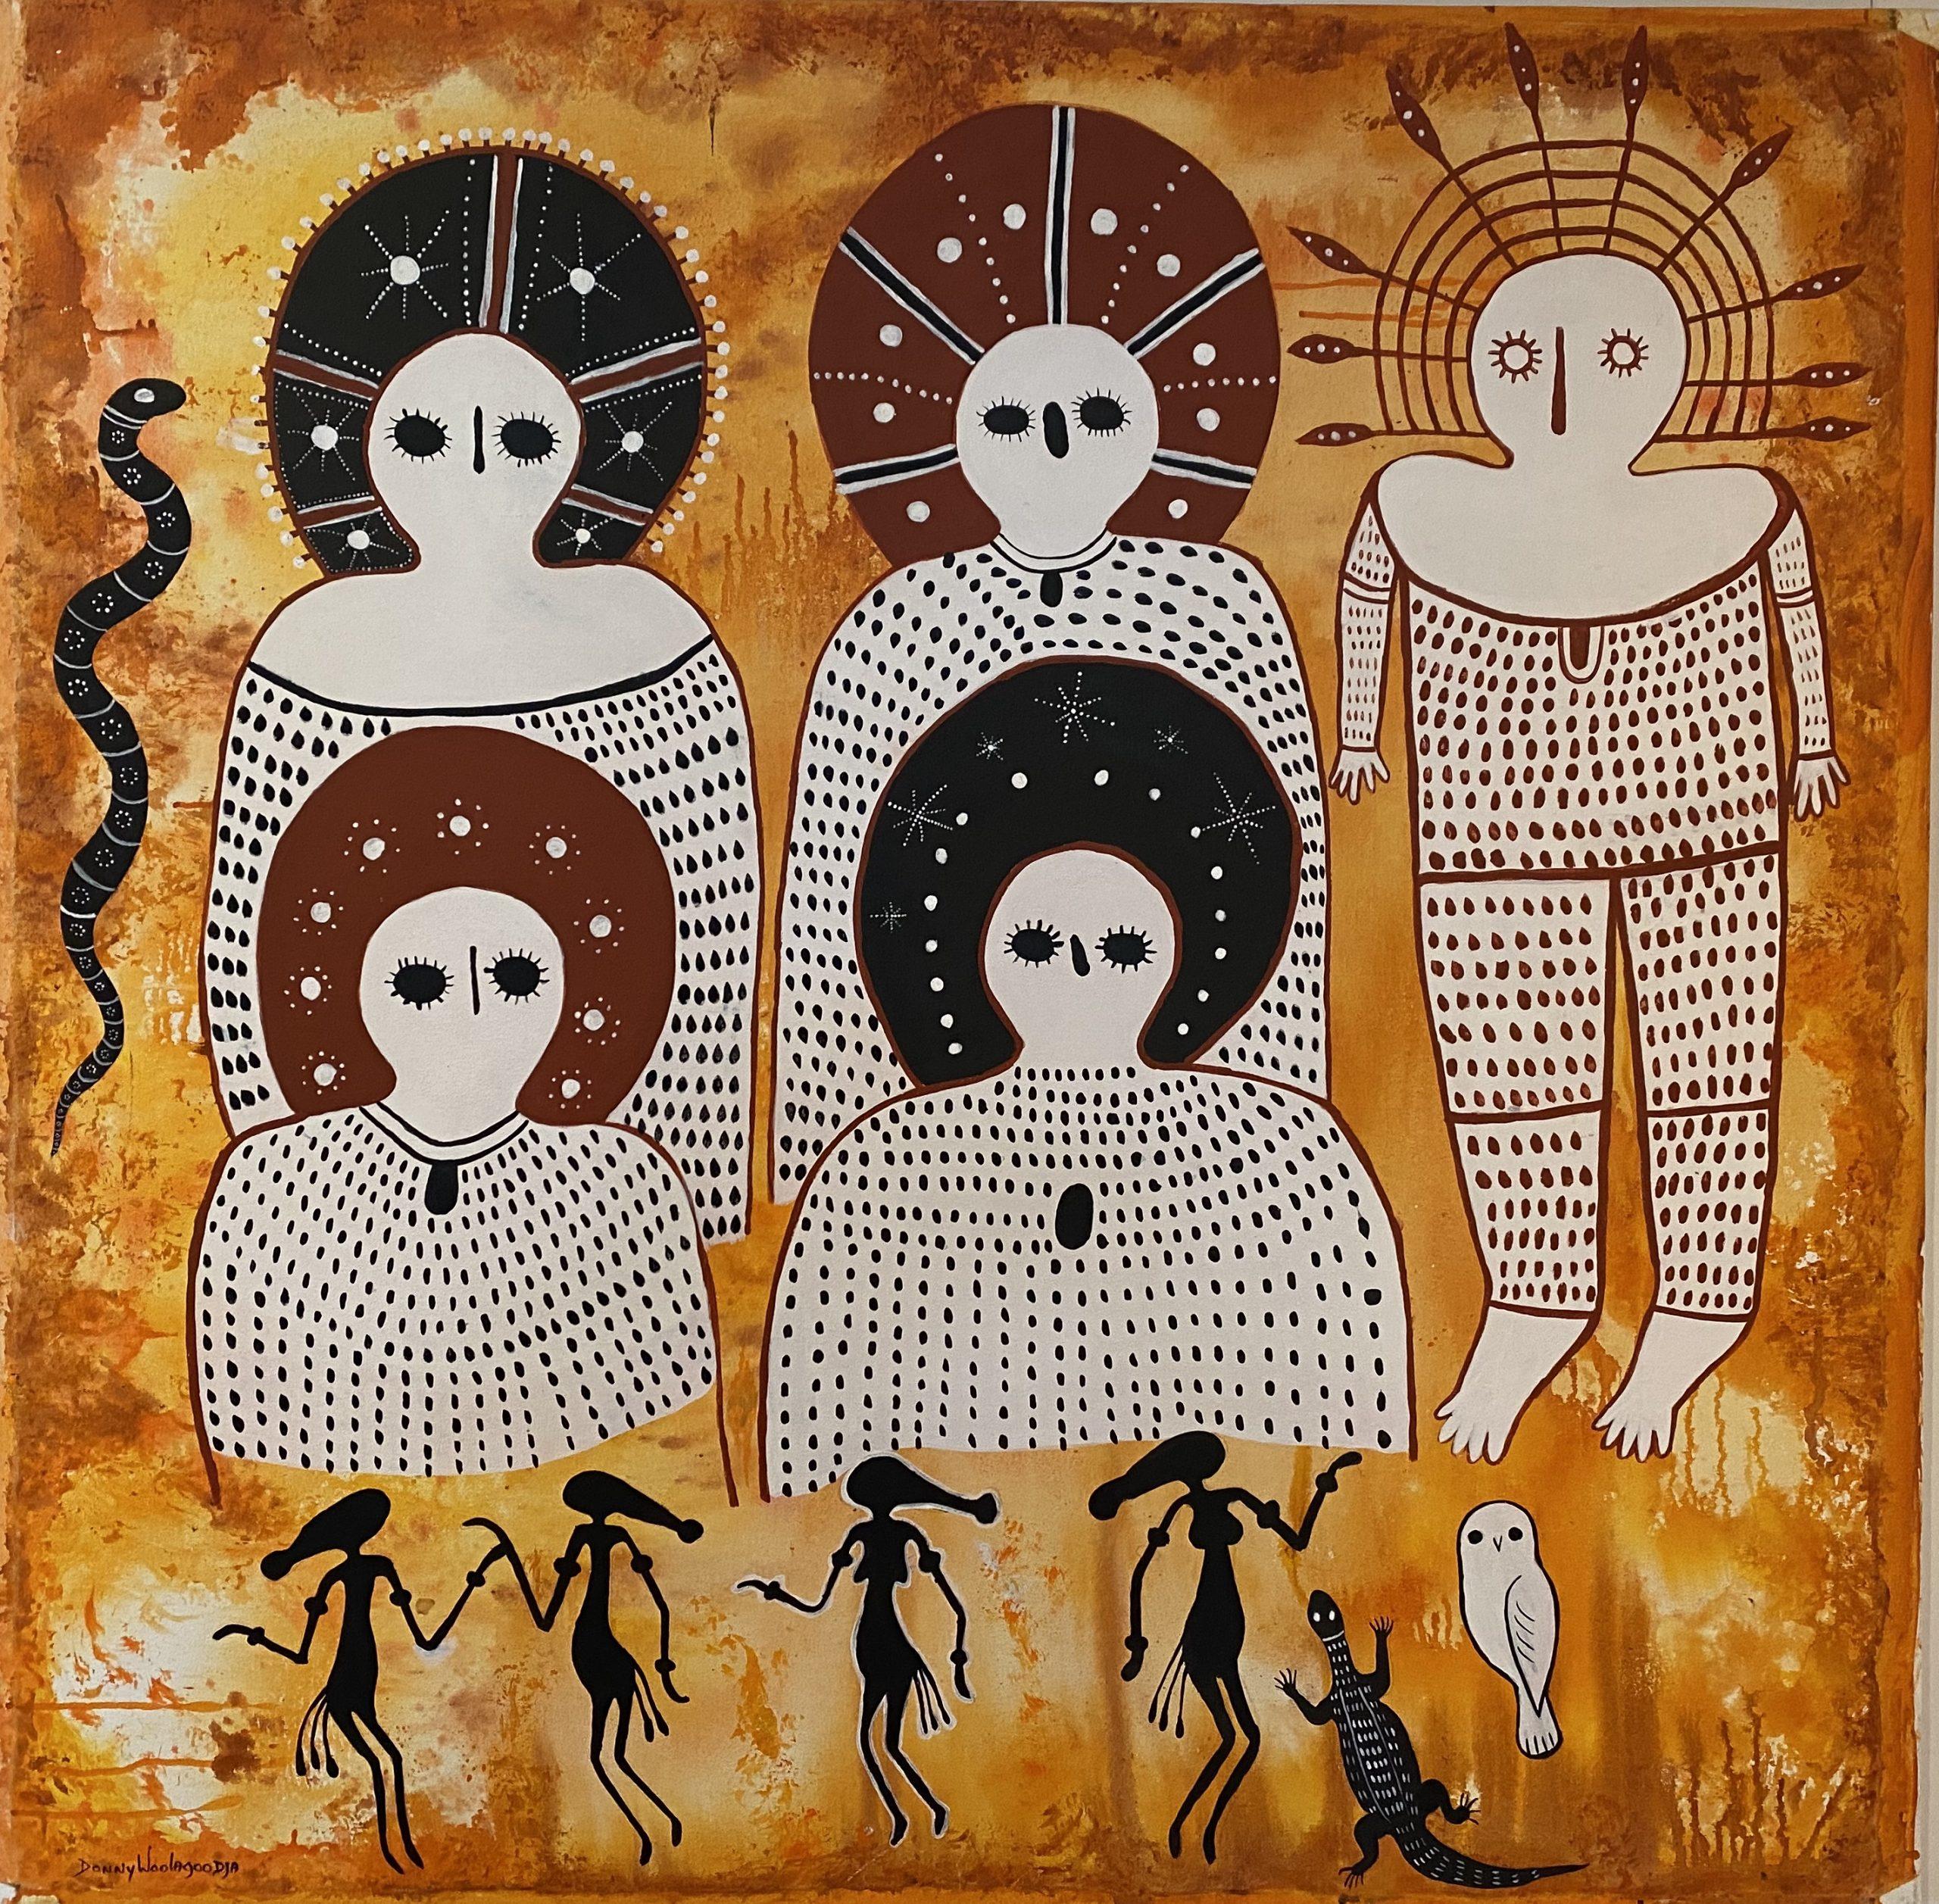 Donny Woolagoodja, Wandjina Dreaming, 2018, acrylic on canvas, 123 x 123cm. Image couresty of Mowanjum Arts